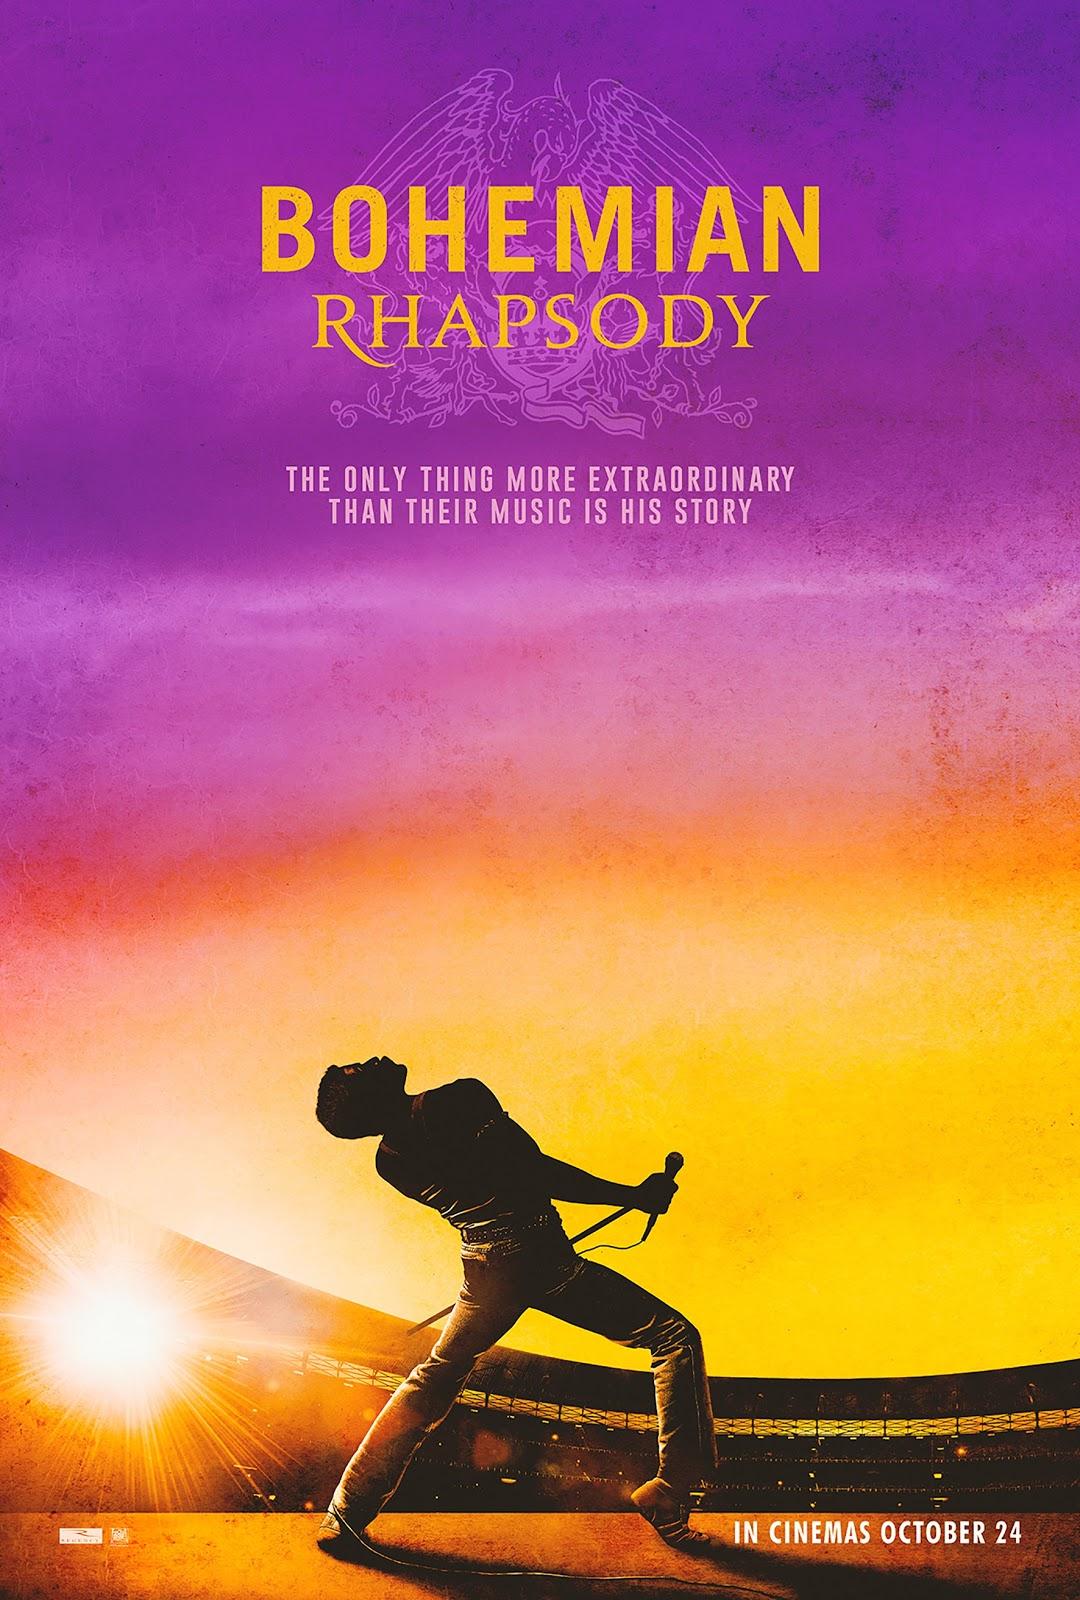 Bohemian Rhapsody - The Movie